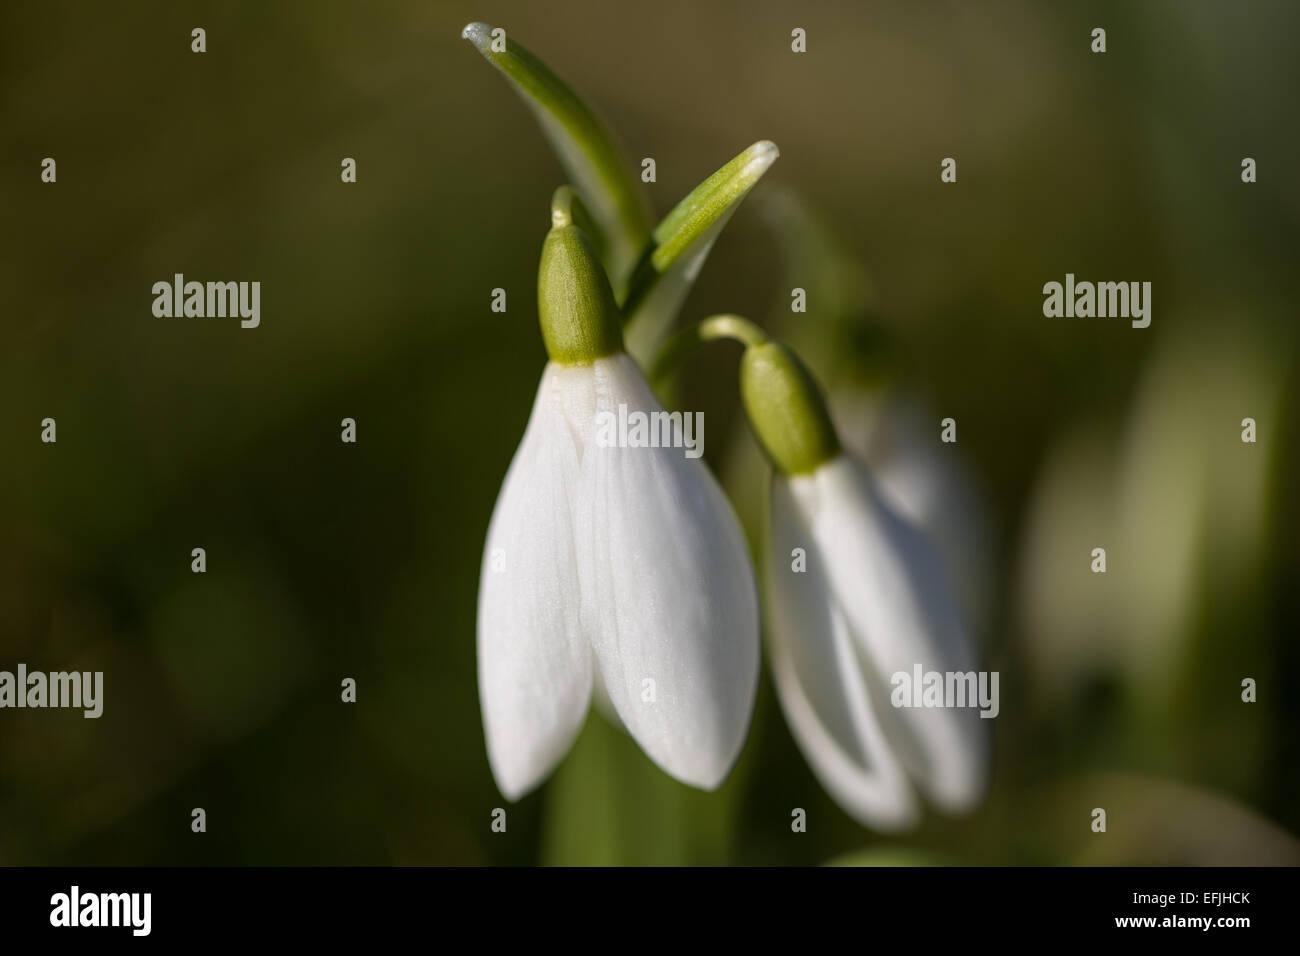 Macro of snowdrop, Galanthus at Kerry churchyard. - Stock Image